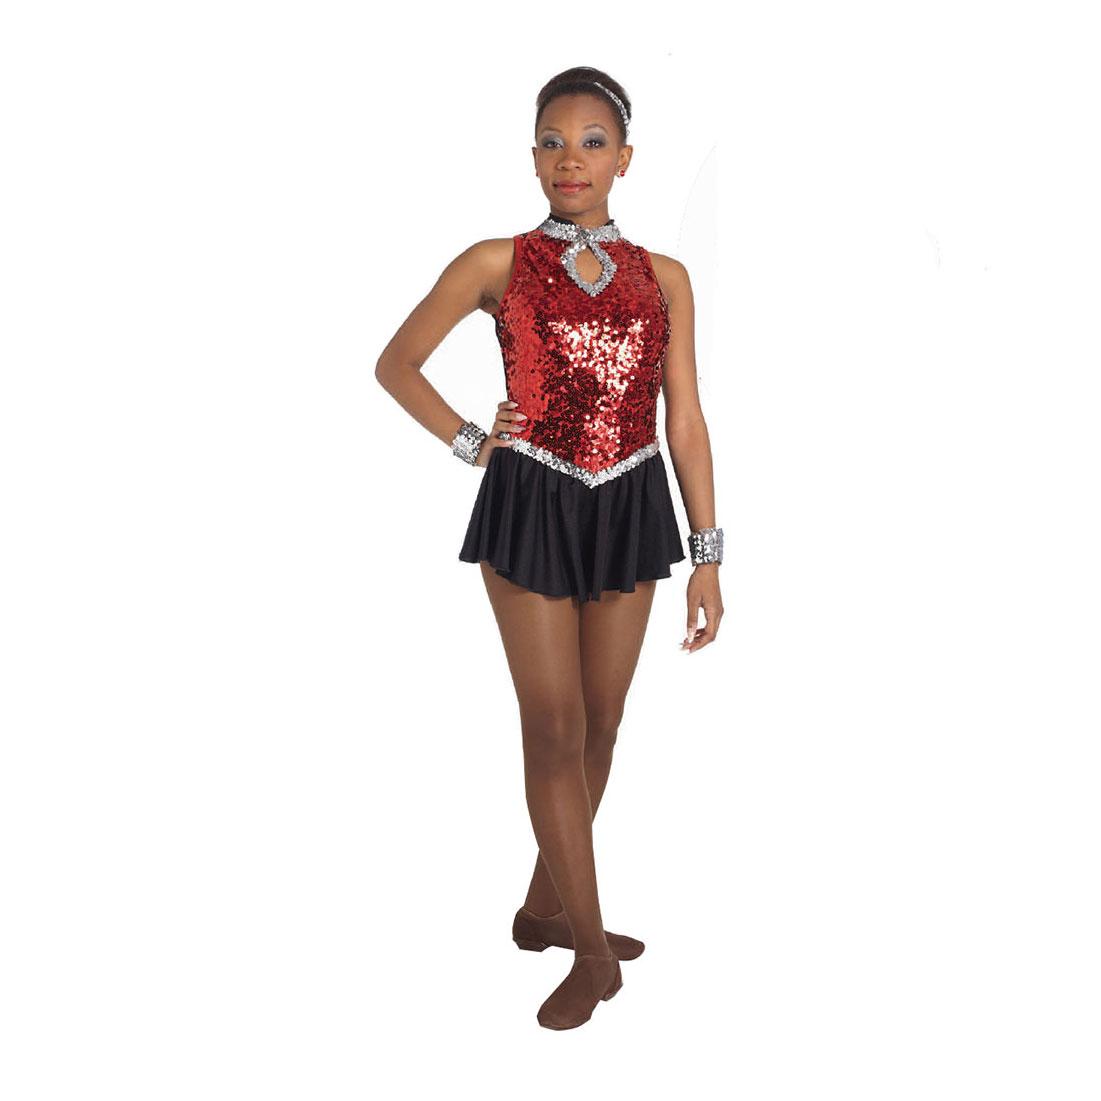 Guard Uniforms: Fascination Demi Dress